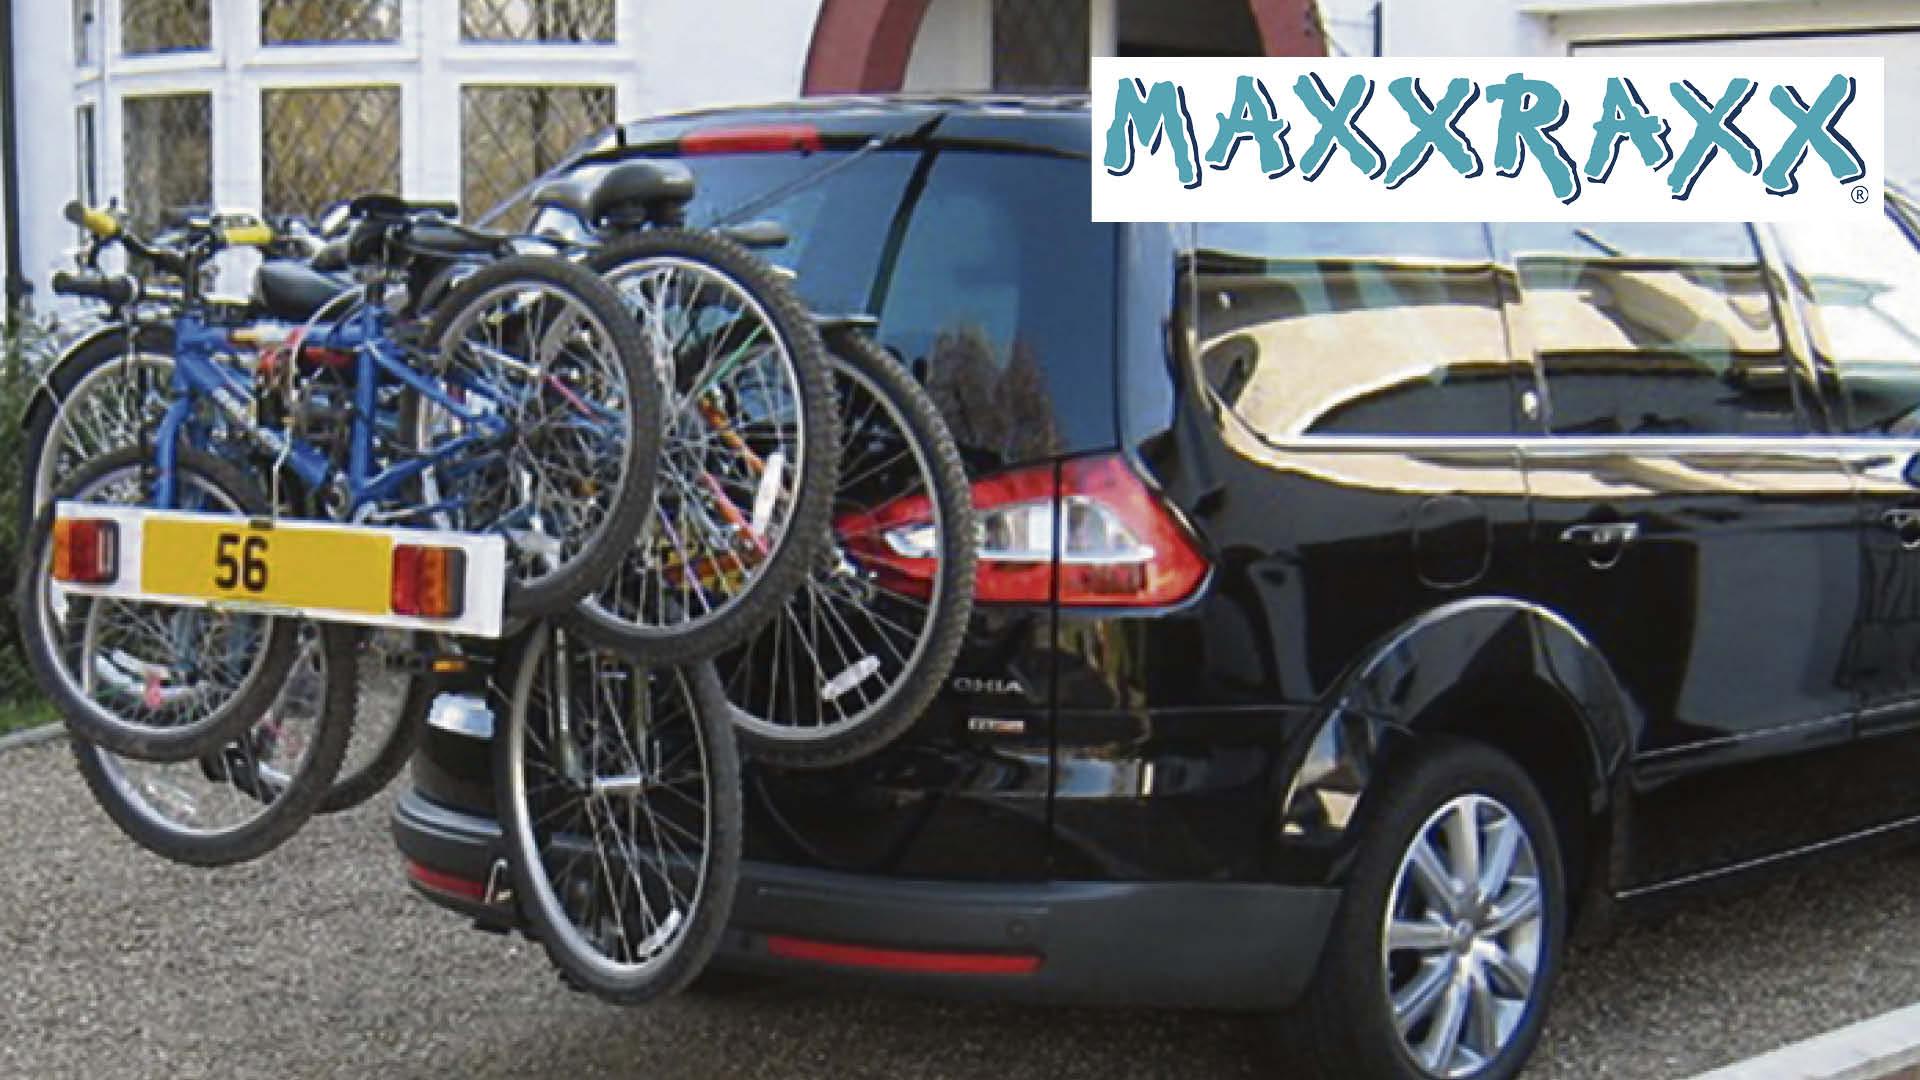 Win a MAXXRAXX cycle tow bar plus a kit bag and wall bracket Worth £309.95!